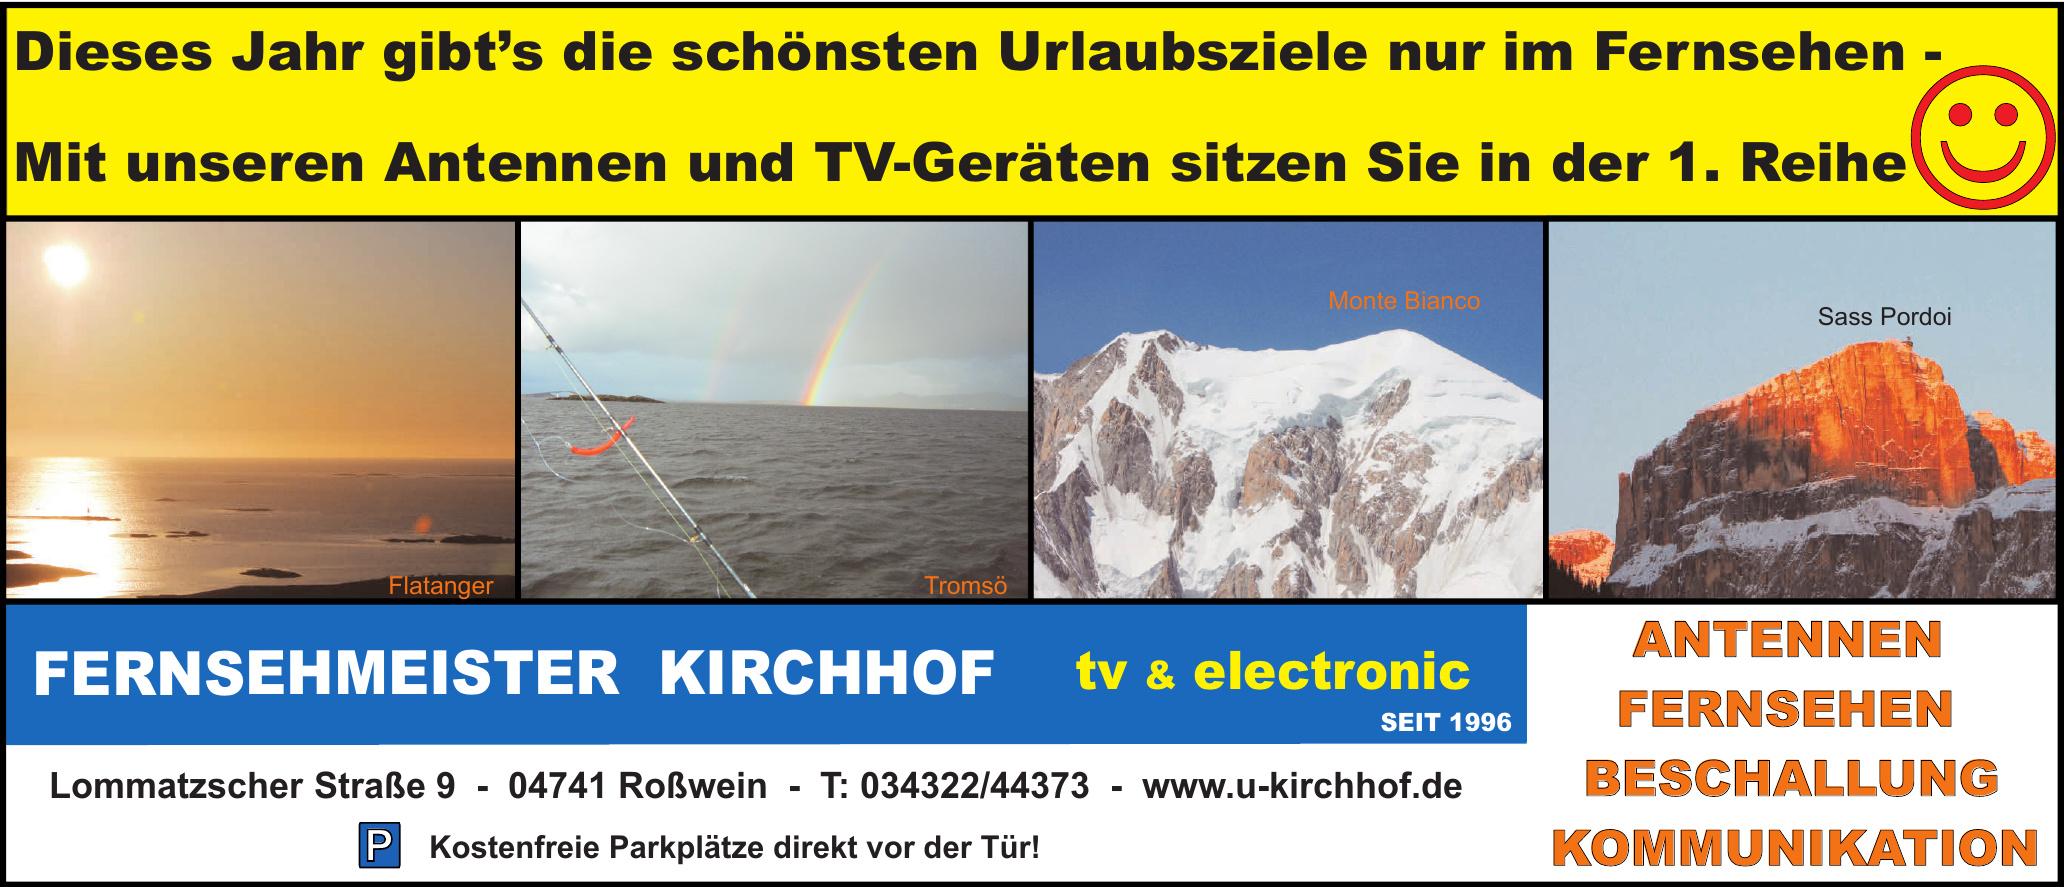 Fernsehmeister Kirchhof tv & electronnic